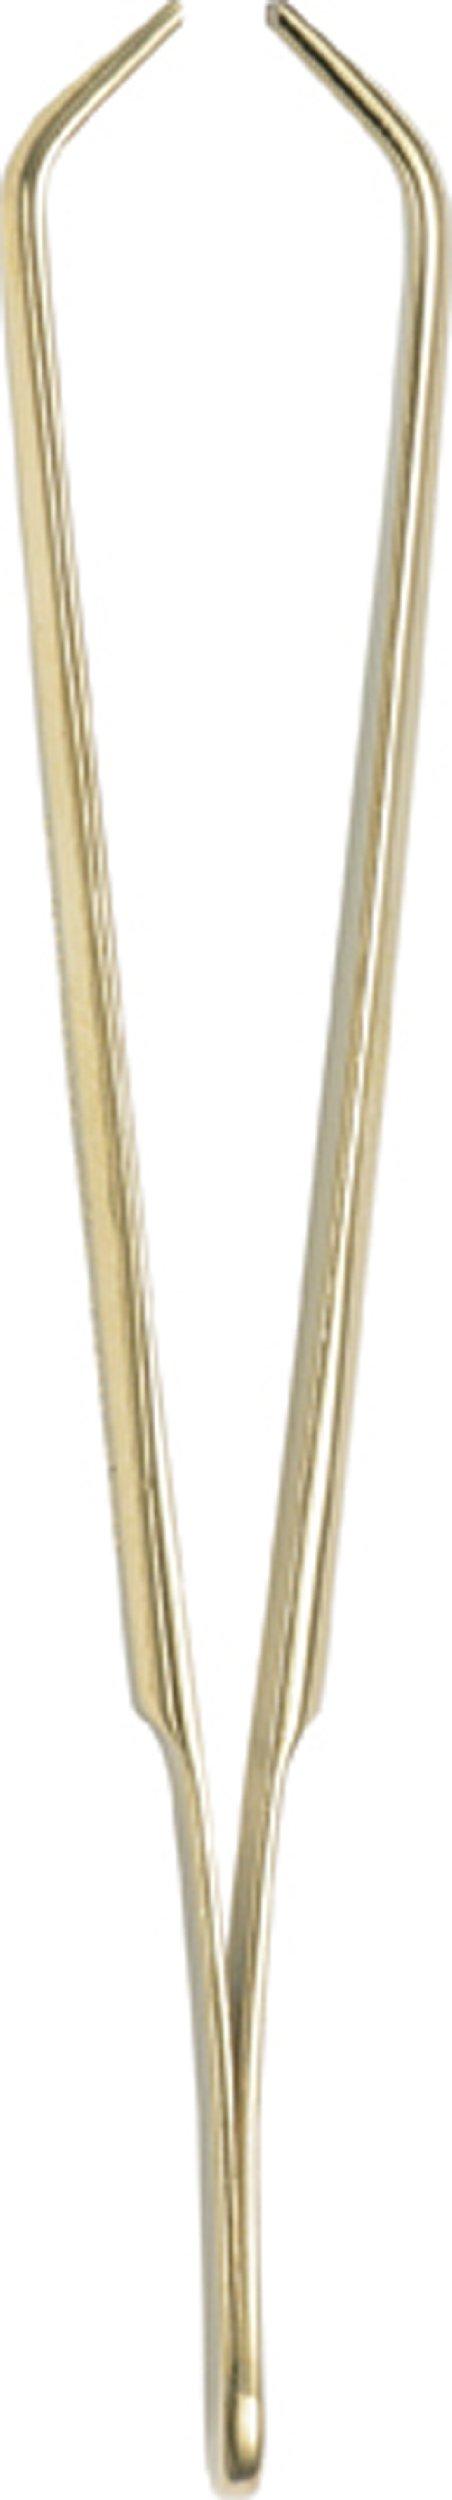 Pfeilring Tweezers, SERVINA 24 K Gold-Plate Clamp Jaw, 9cm, .46-Ounce Package